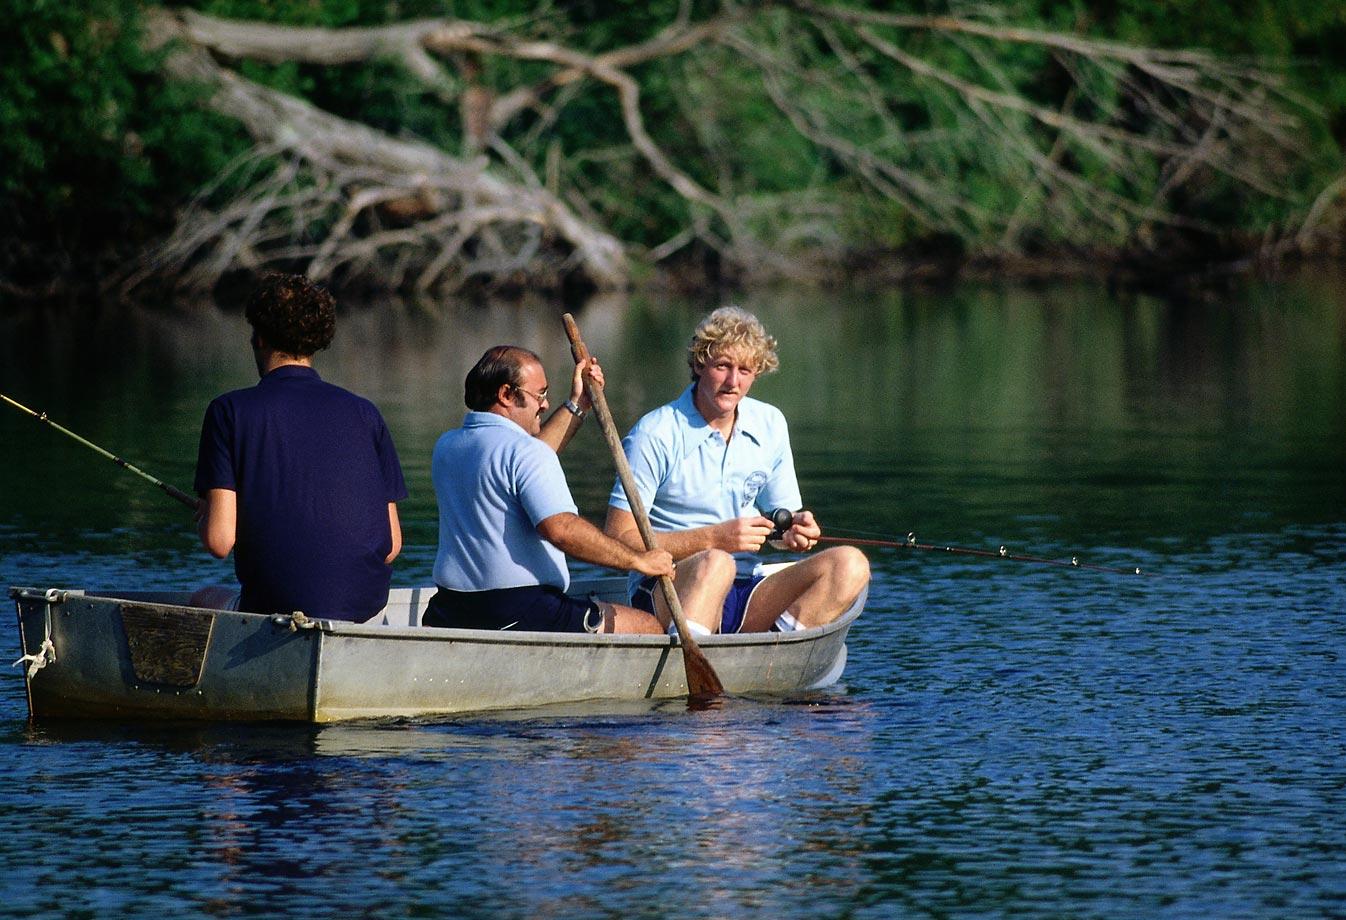 Larry Bird of the Boston Celtics enjoying fishing on the lake while at rookie camp in Boston.